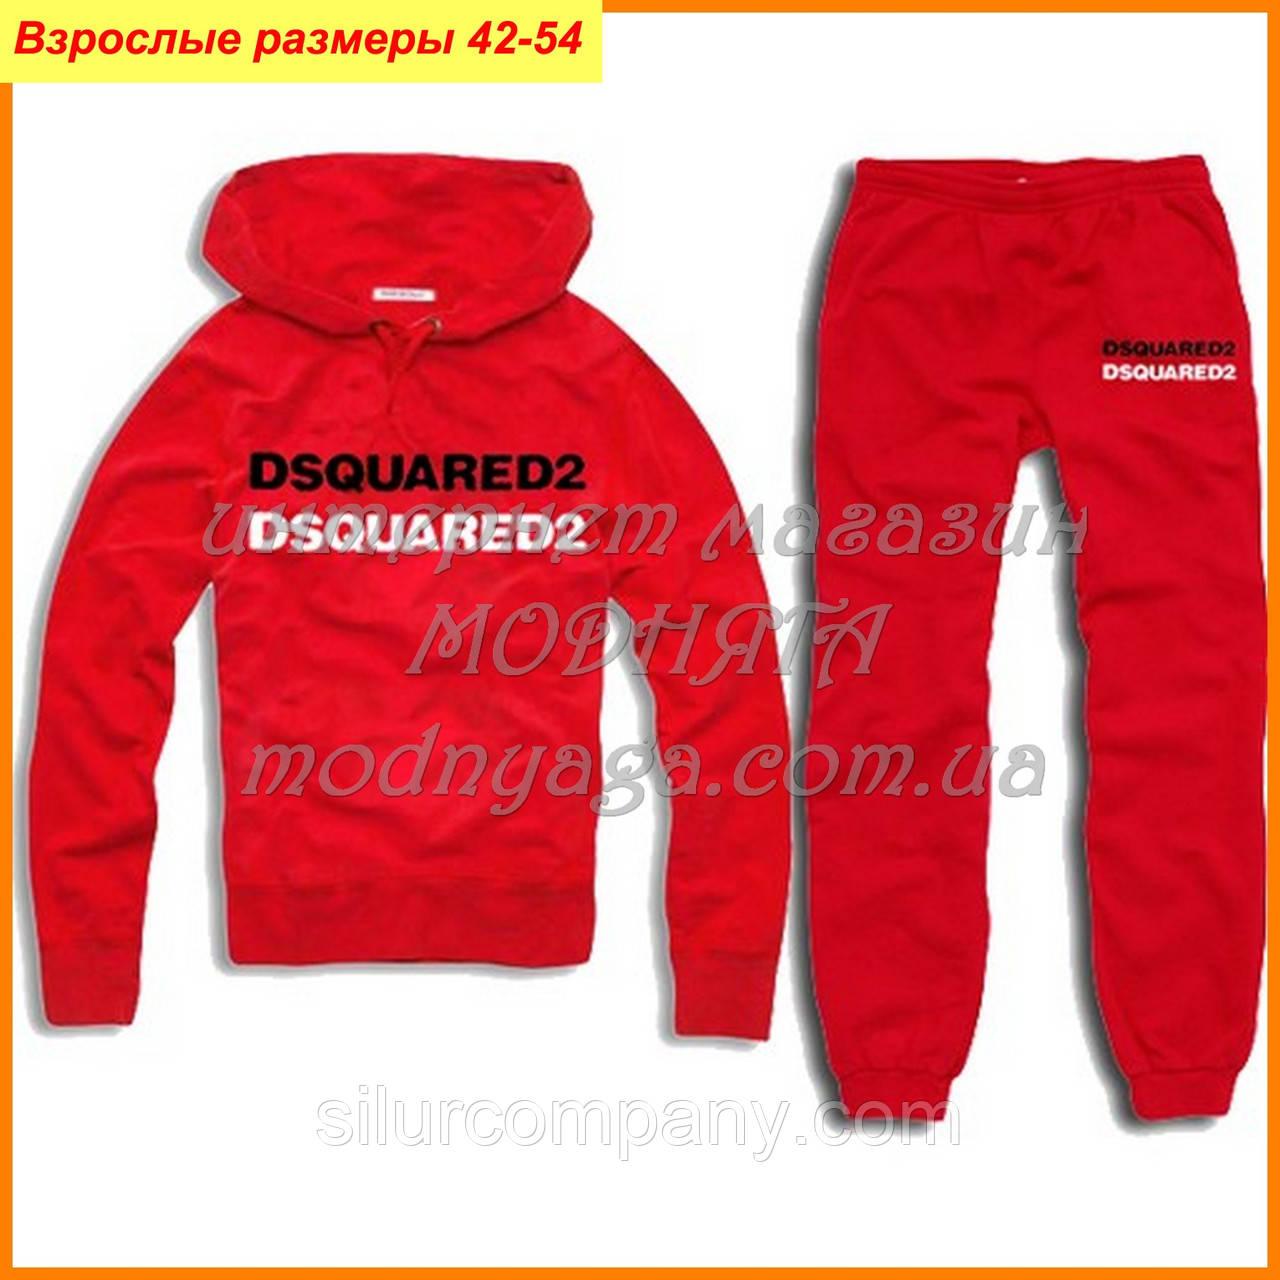 5313d20f Спортивный костюм мужской оригинал - Интернет магазин